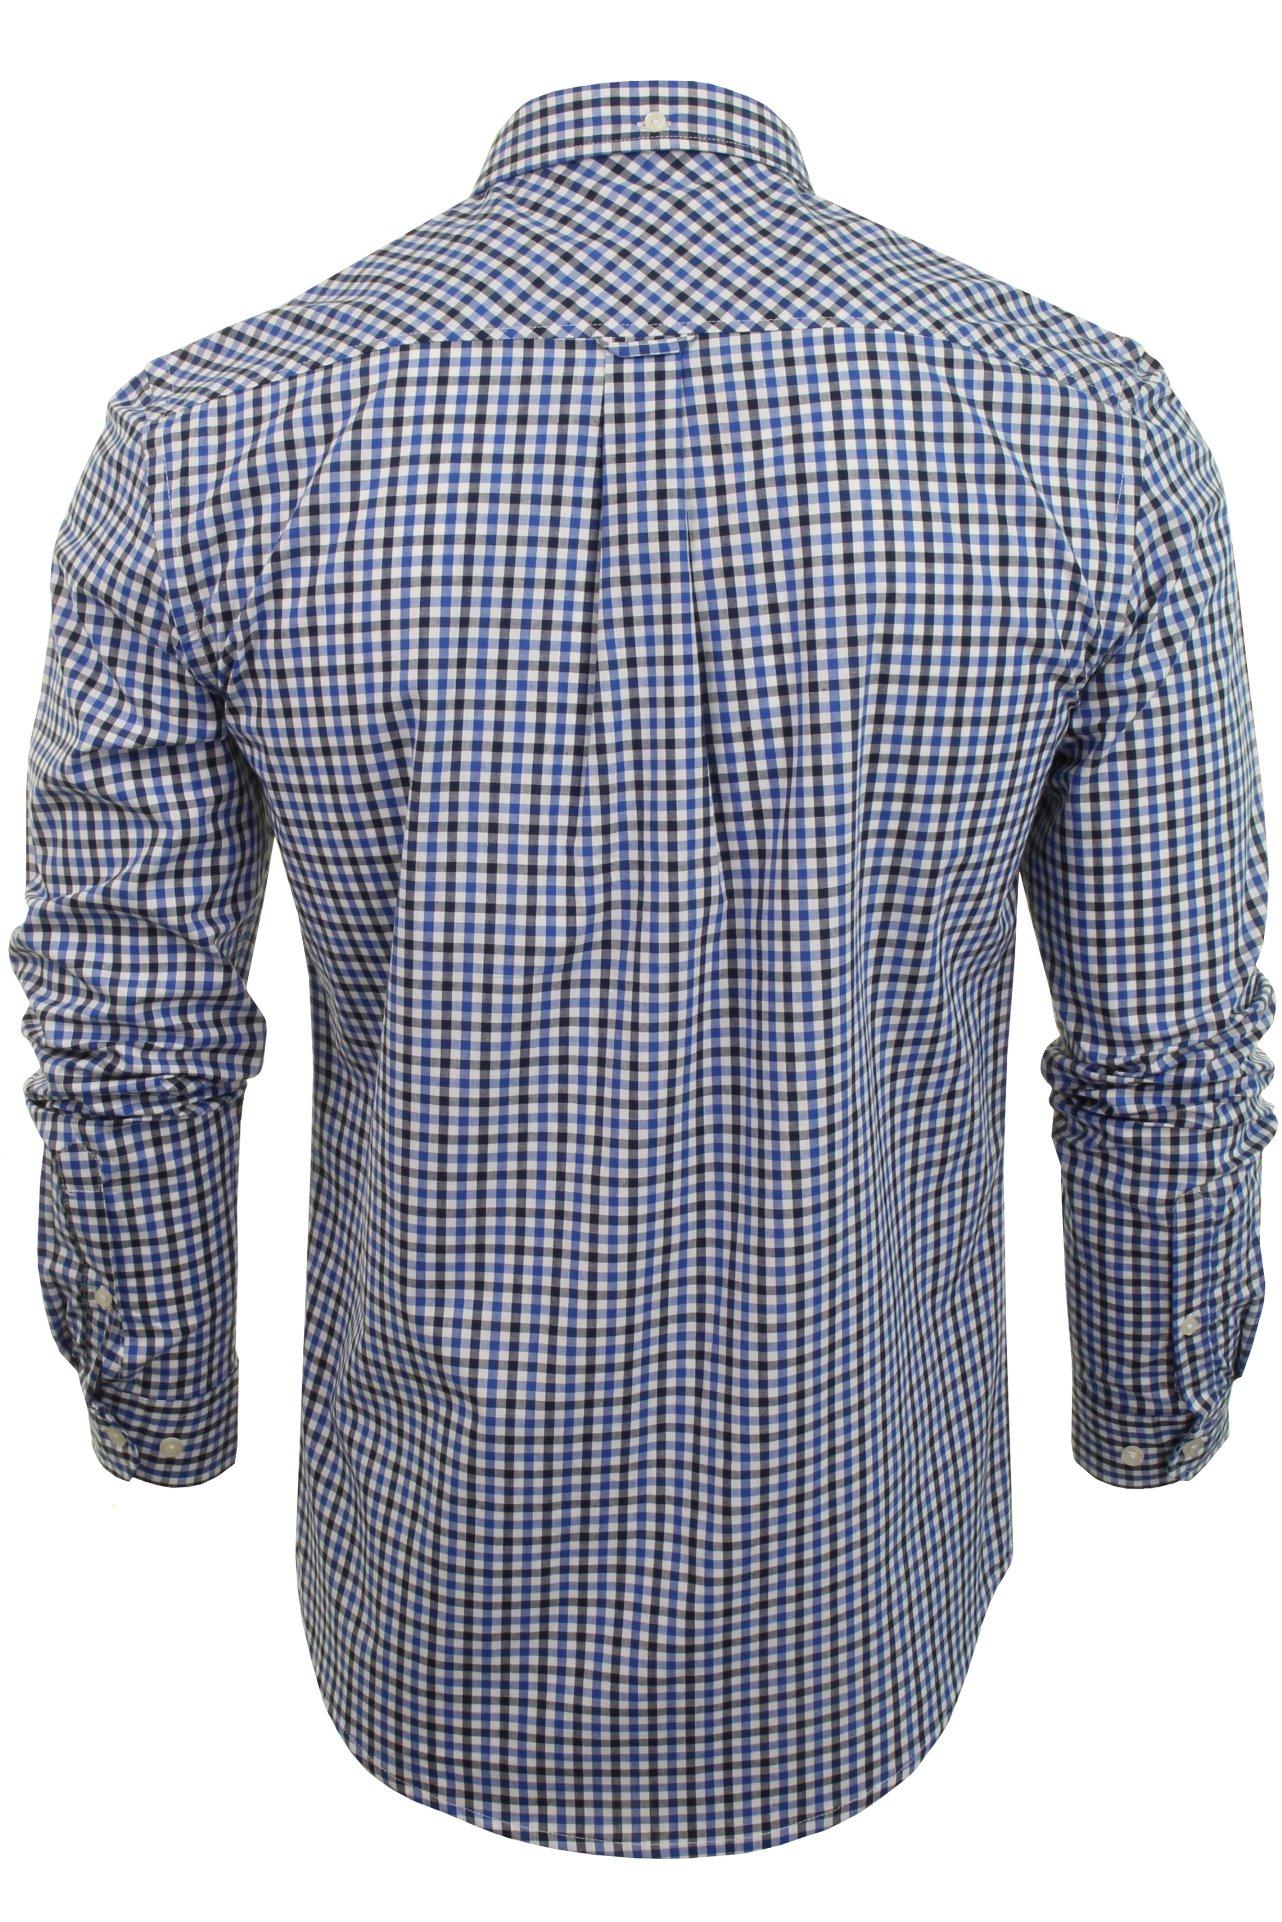 Ben-Sherman-Men-039-s-Long-Sleeved-Gingham-Check-Shirt thumbnail 5